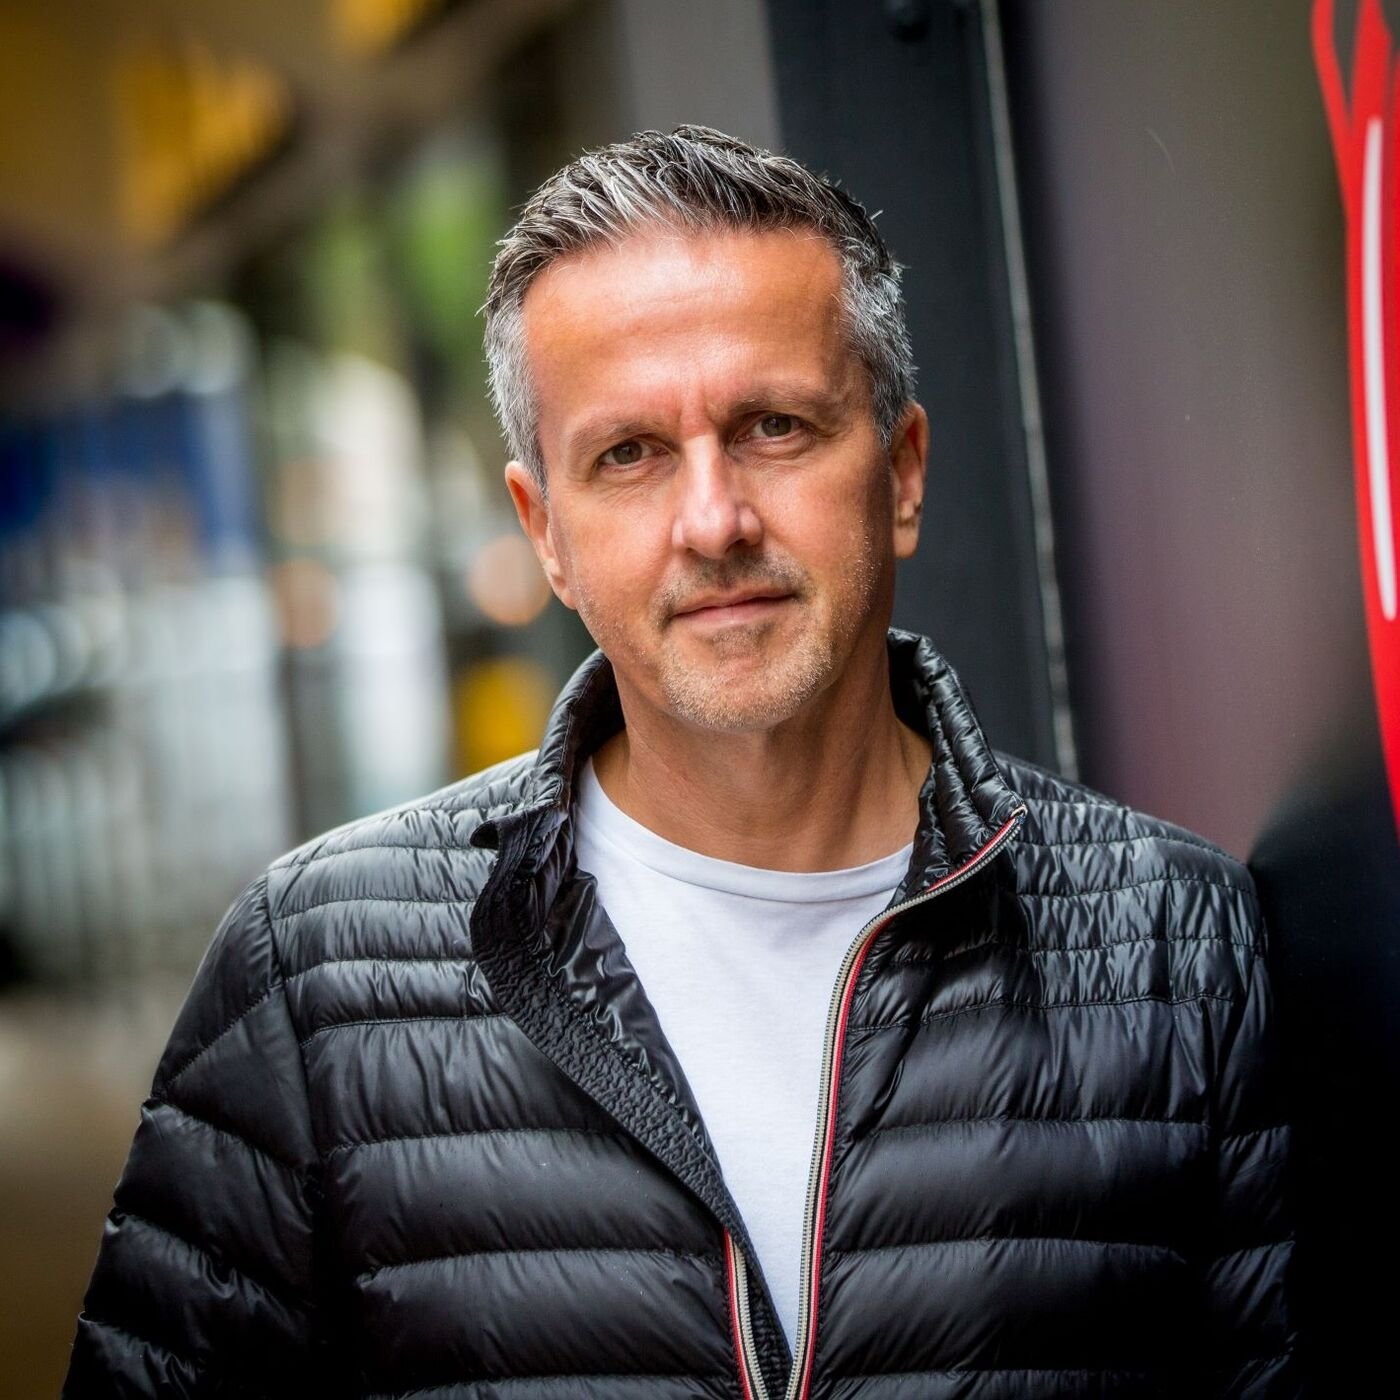 David Boyne, Managing Director at Bravado